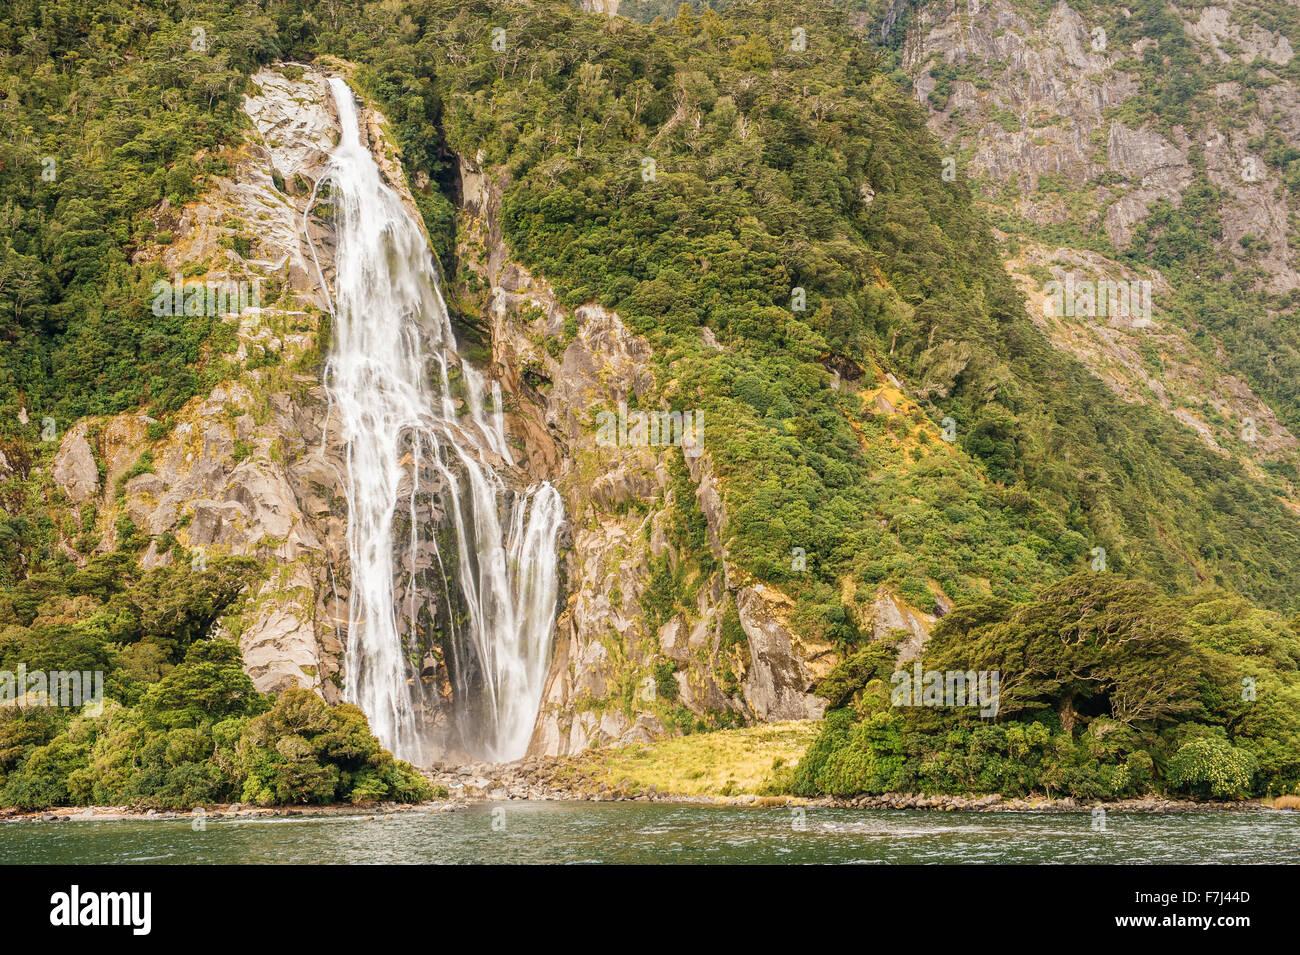 Milford sound, Fiordland National Park, South Island, New Zealand - Stock Image